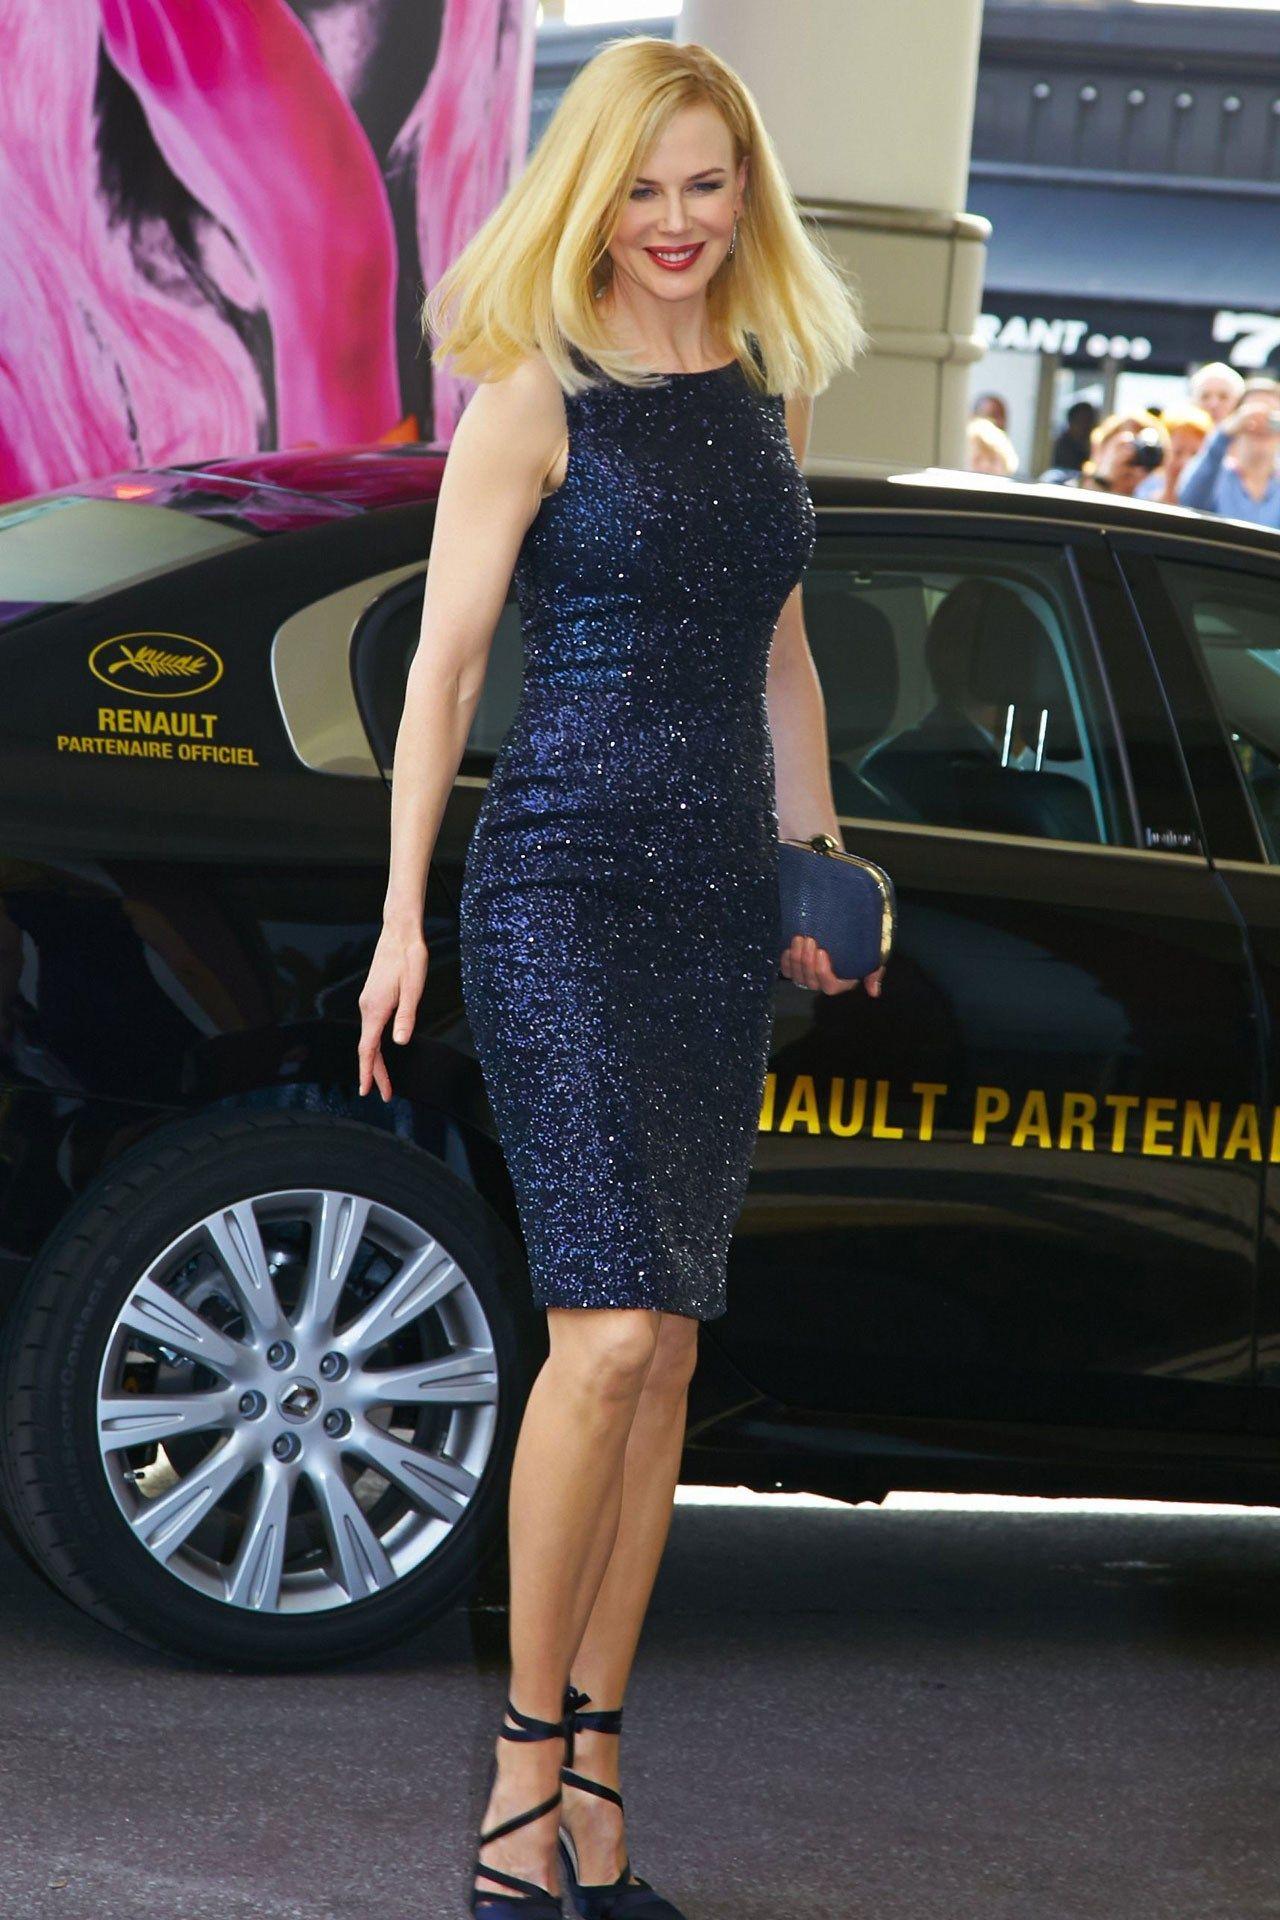 Cannes Film Festival 2013 Womens black dress, Cannes